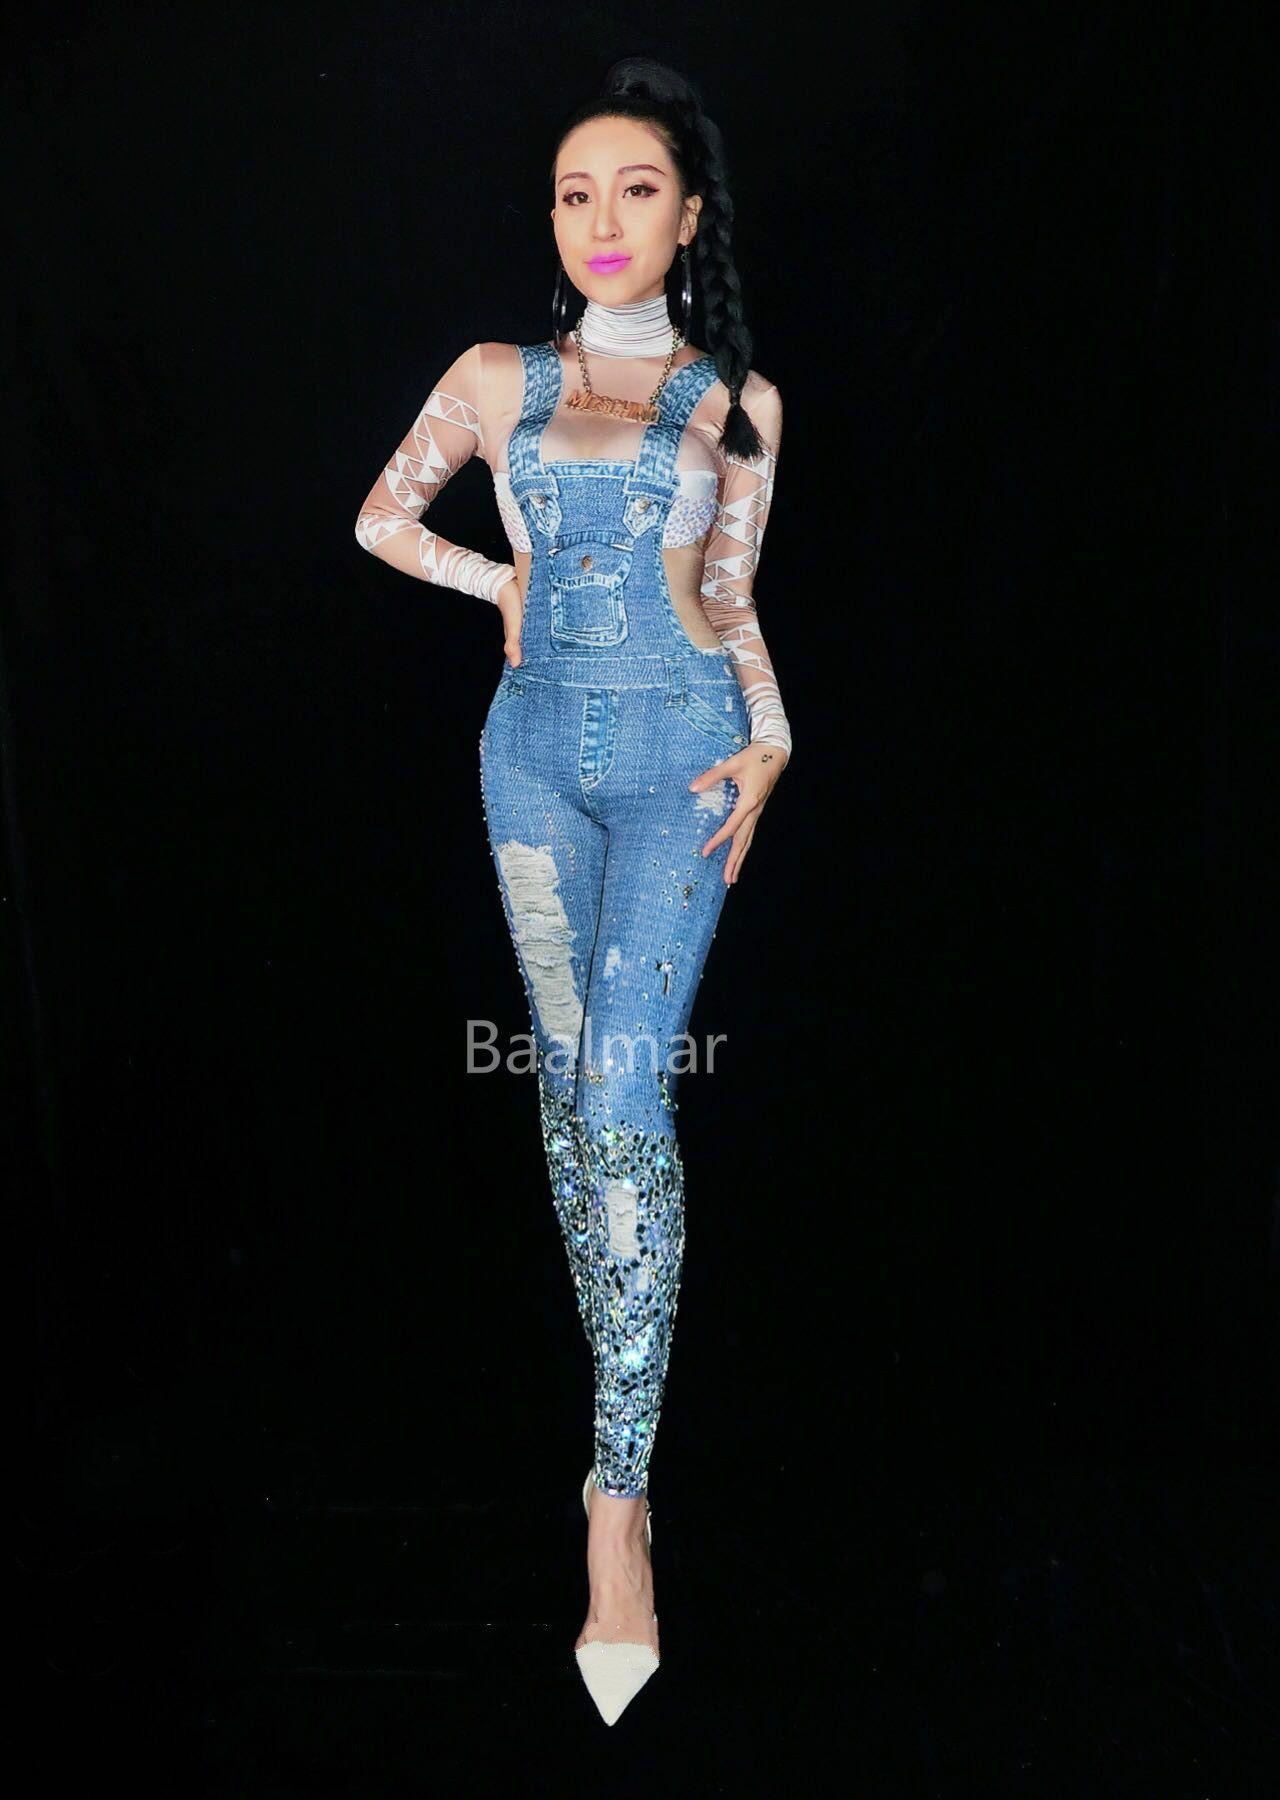 efc40b0f8a Nightclub jeans rhinestones jumpsuit sexy denim printed costume jpg  1280x1800 Bodysuit model jeans